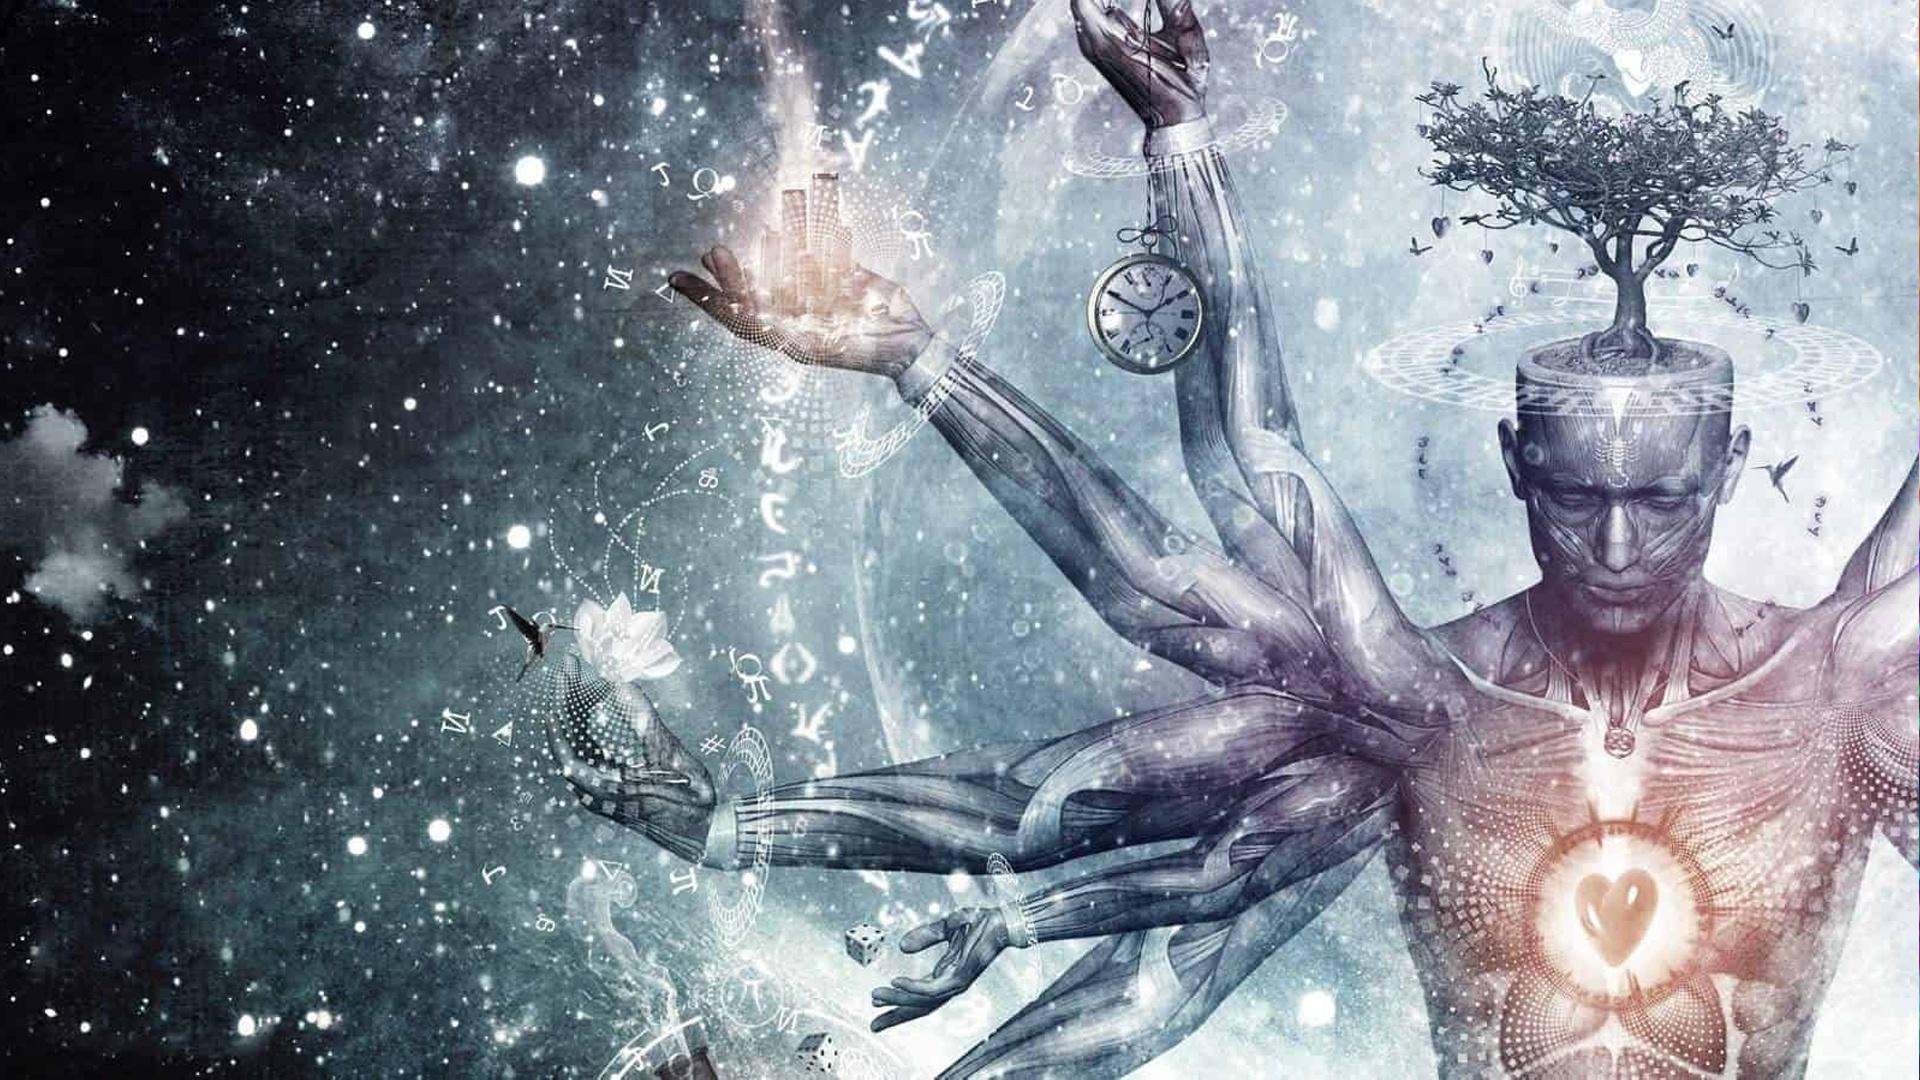 Enlightenment free background